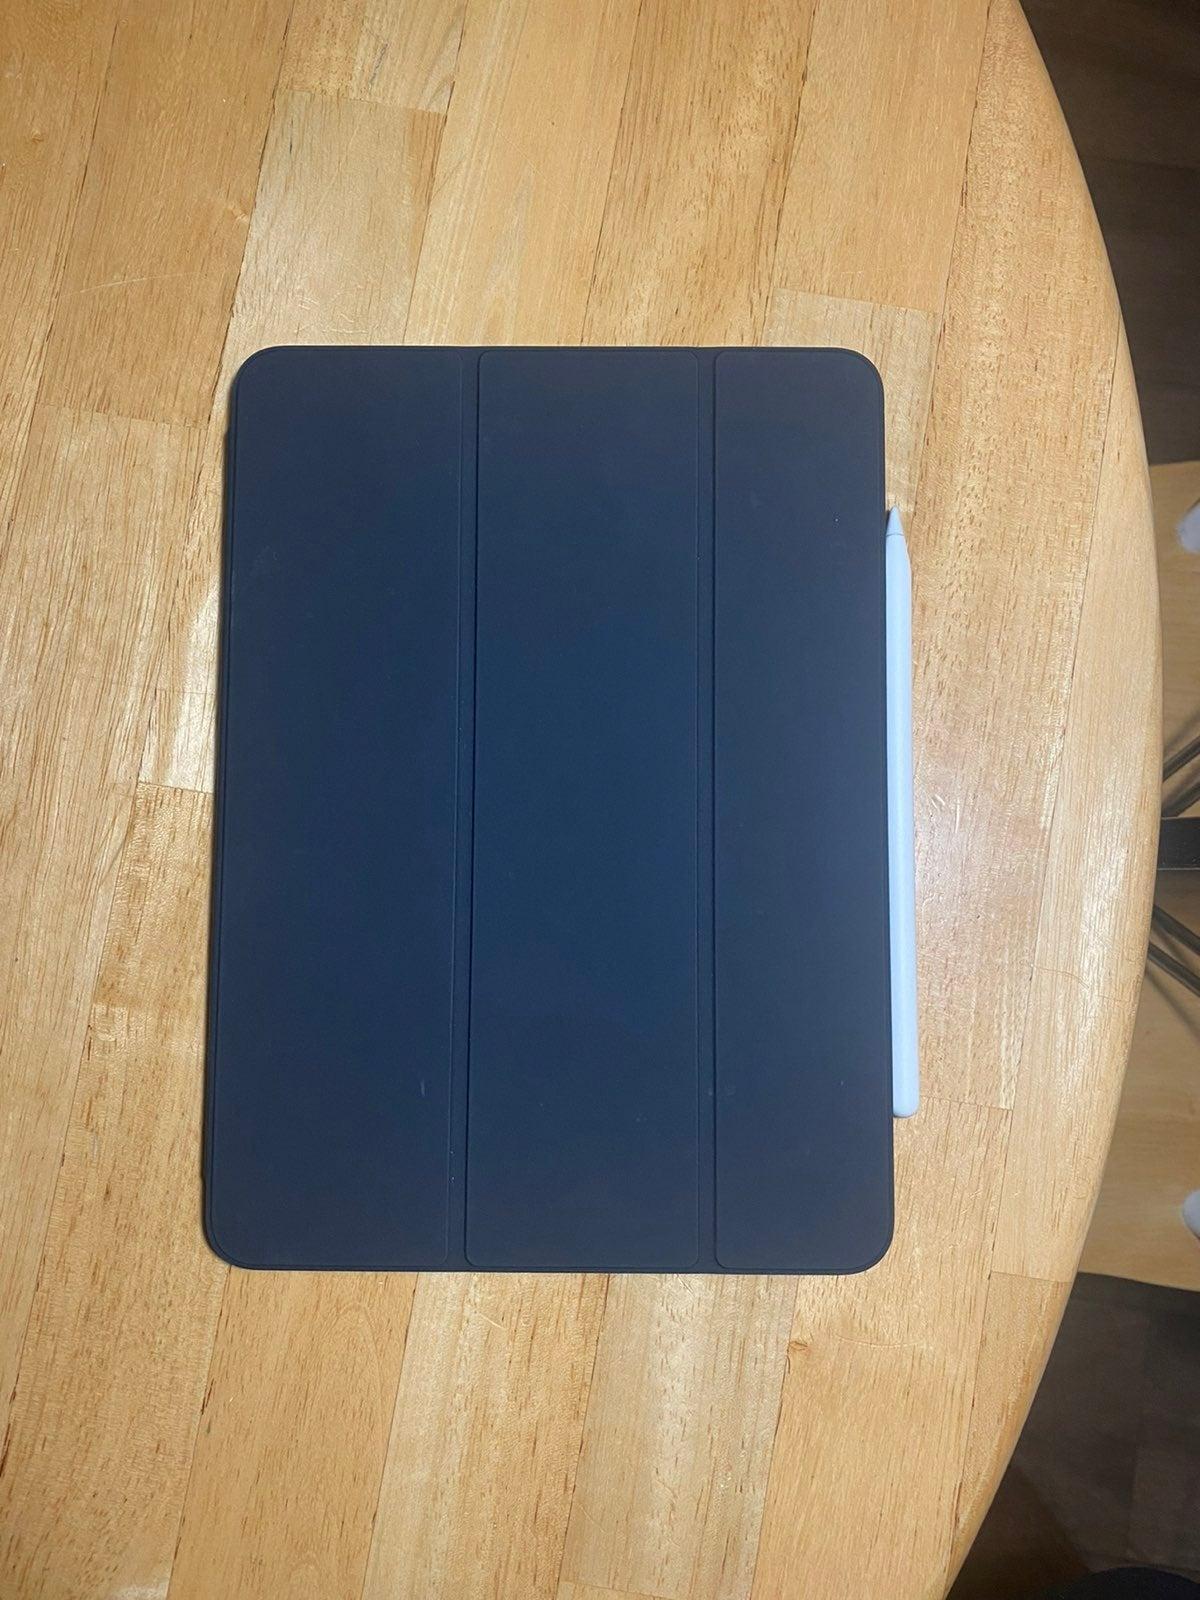 "11"" iPad Pro 2nd Generation 256gb"